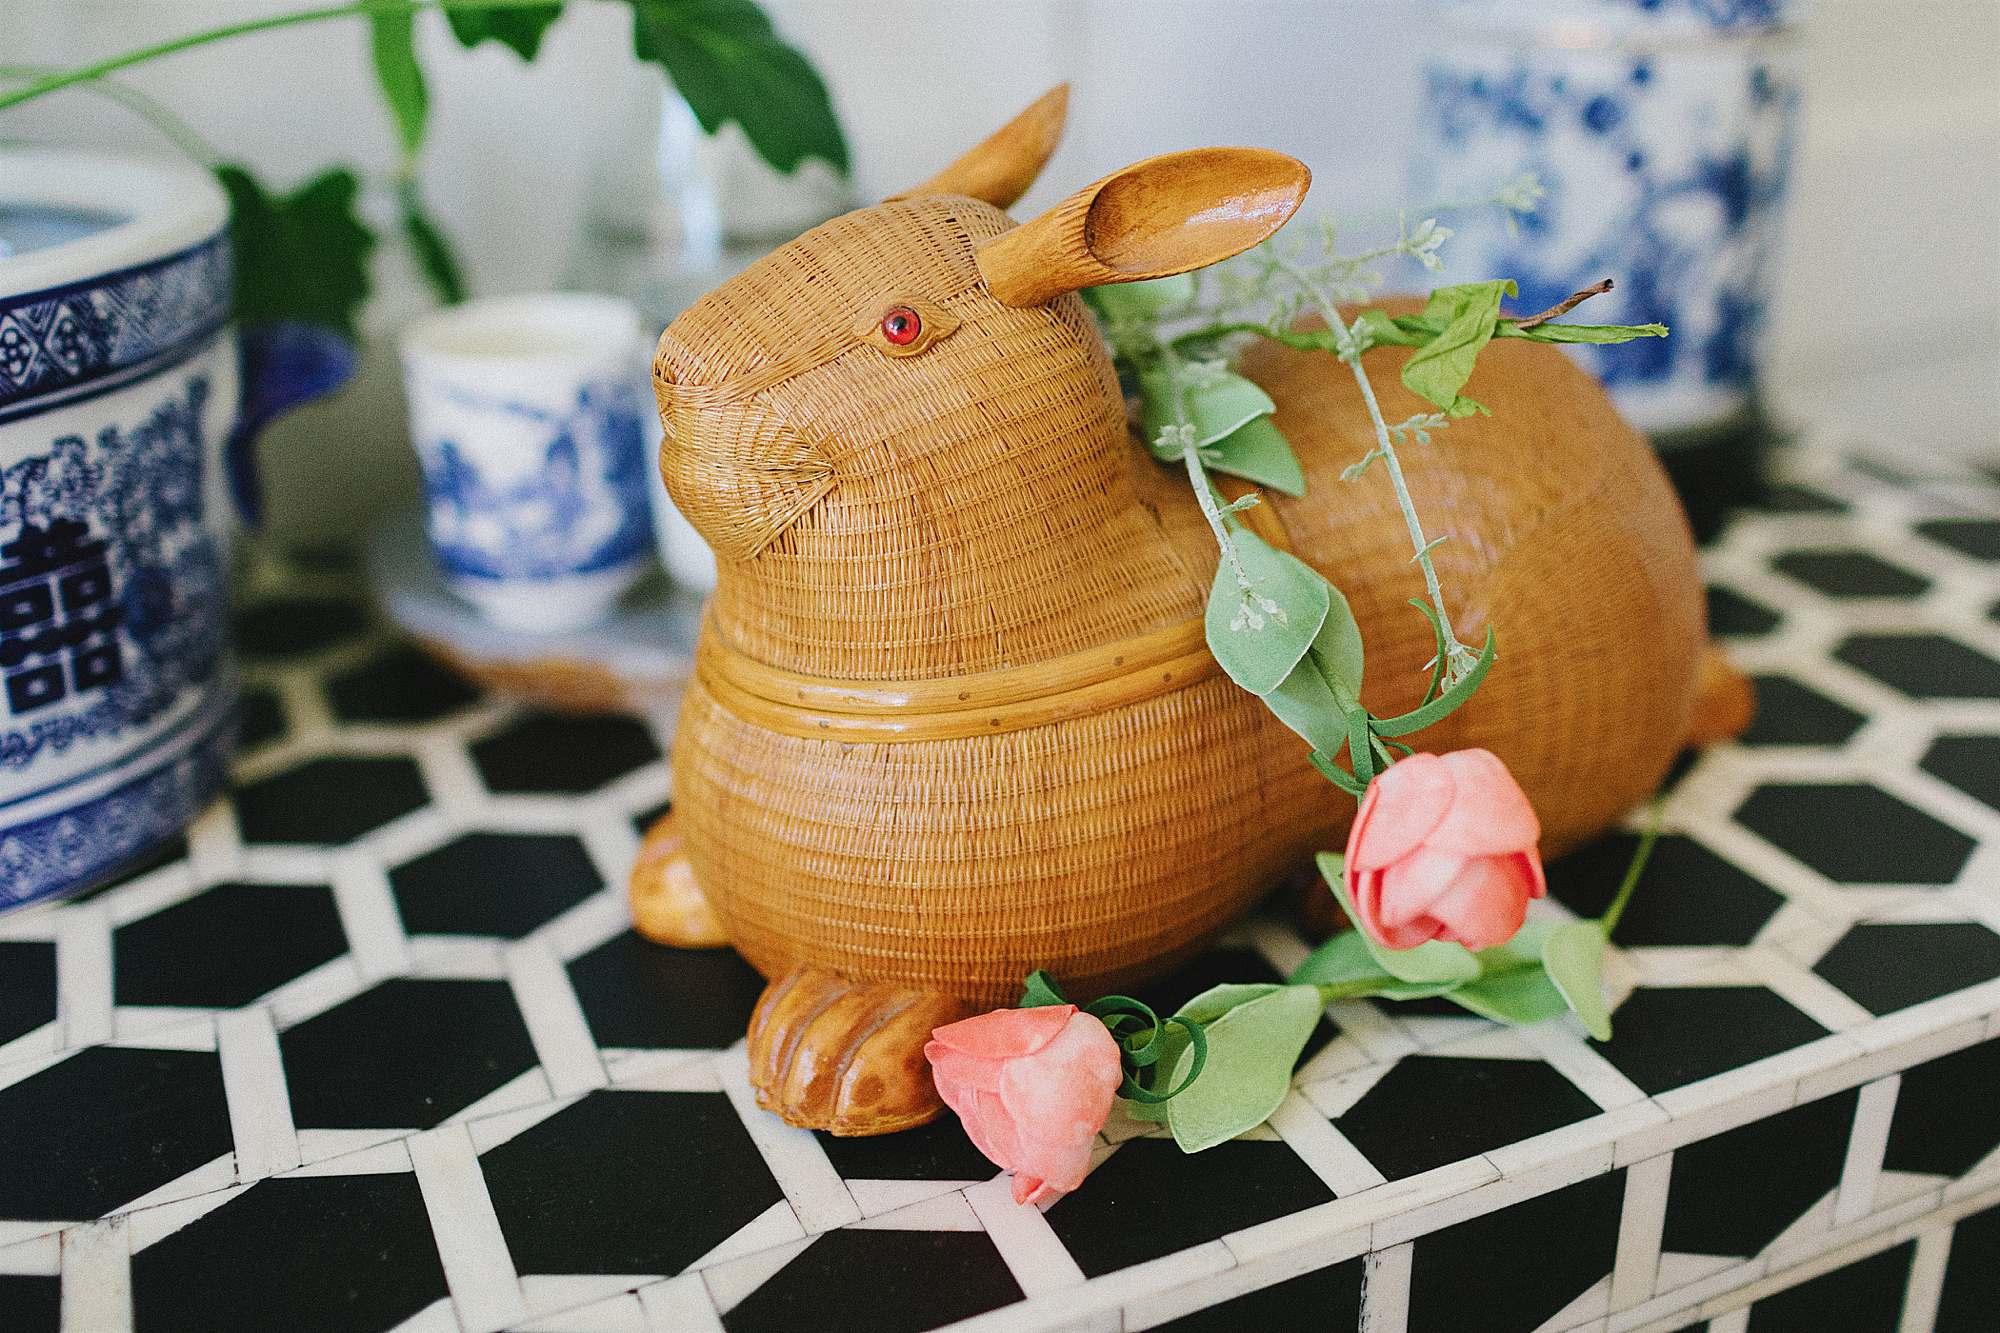 wicker animal basket Shanghai china vintage decor easter bunny basket